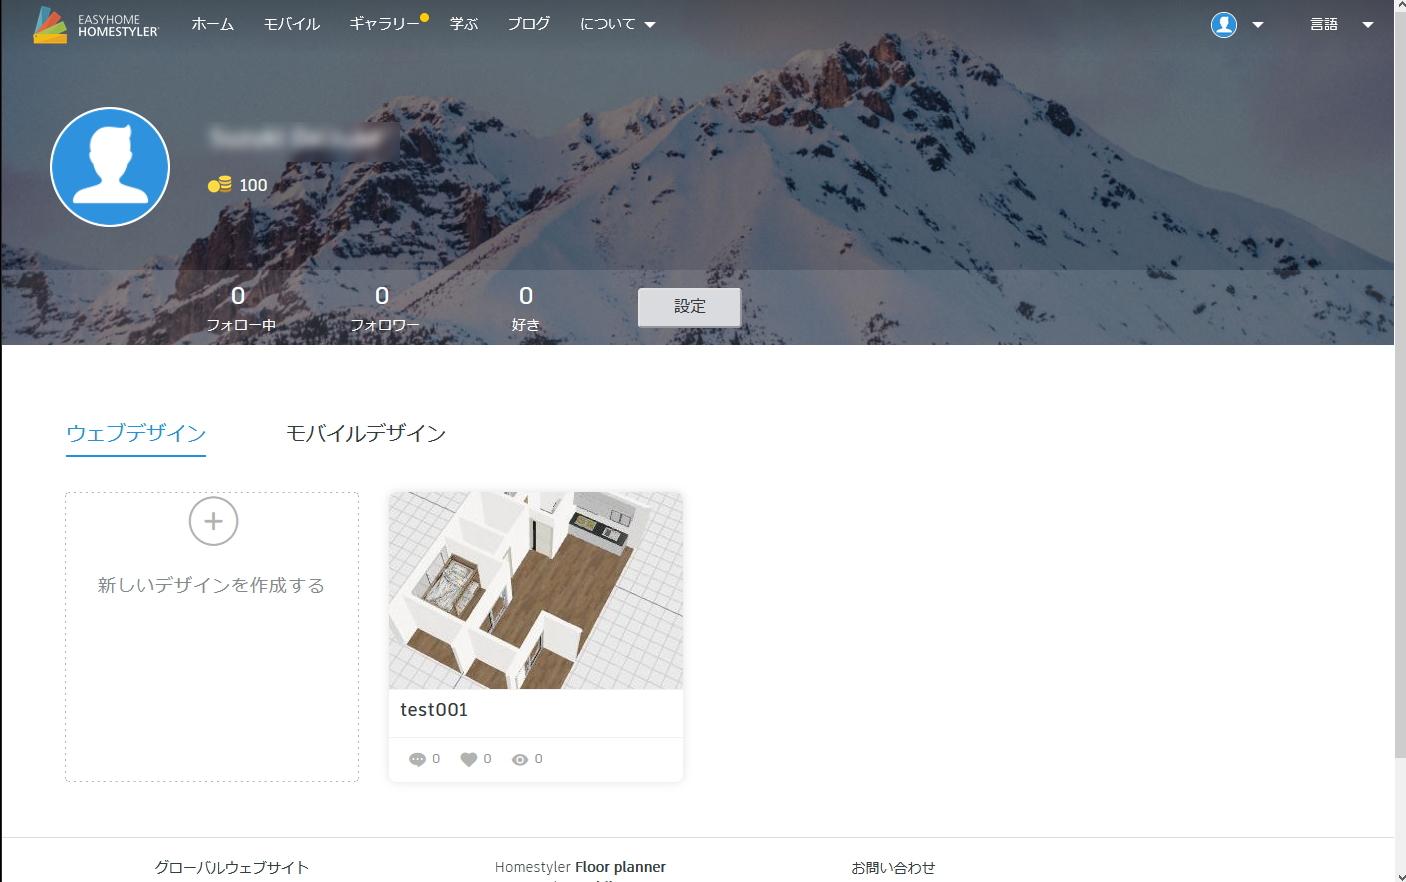 homestyler 「私のデザイン」で管理